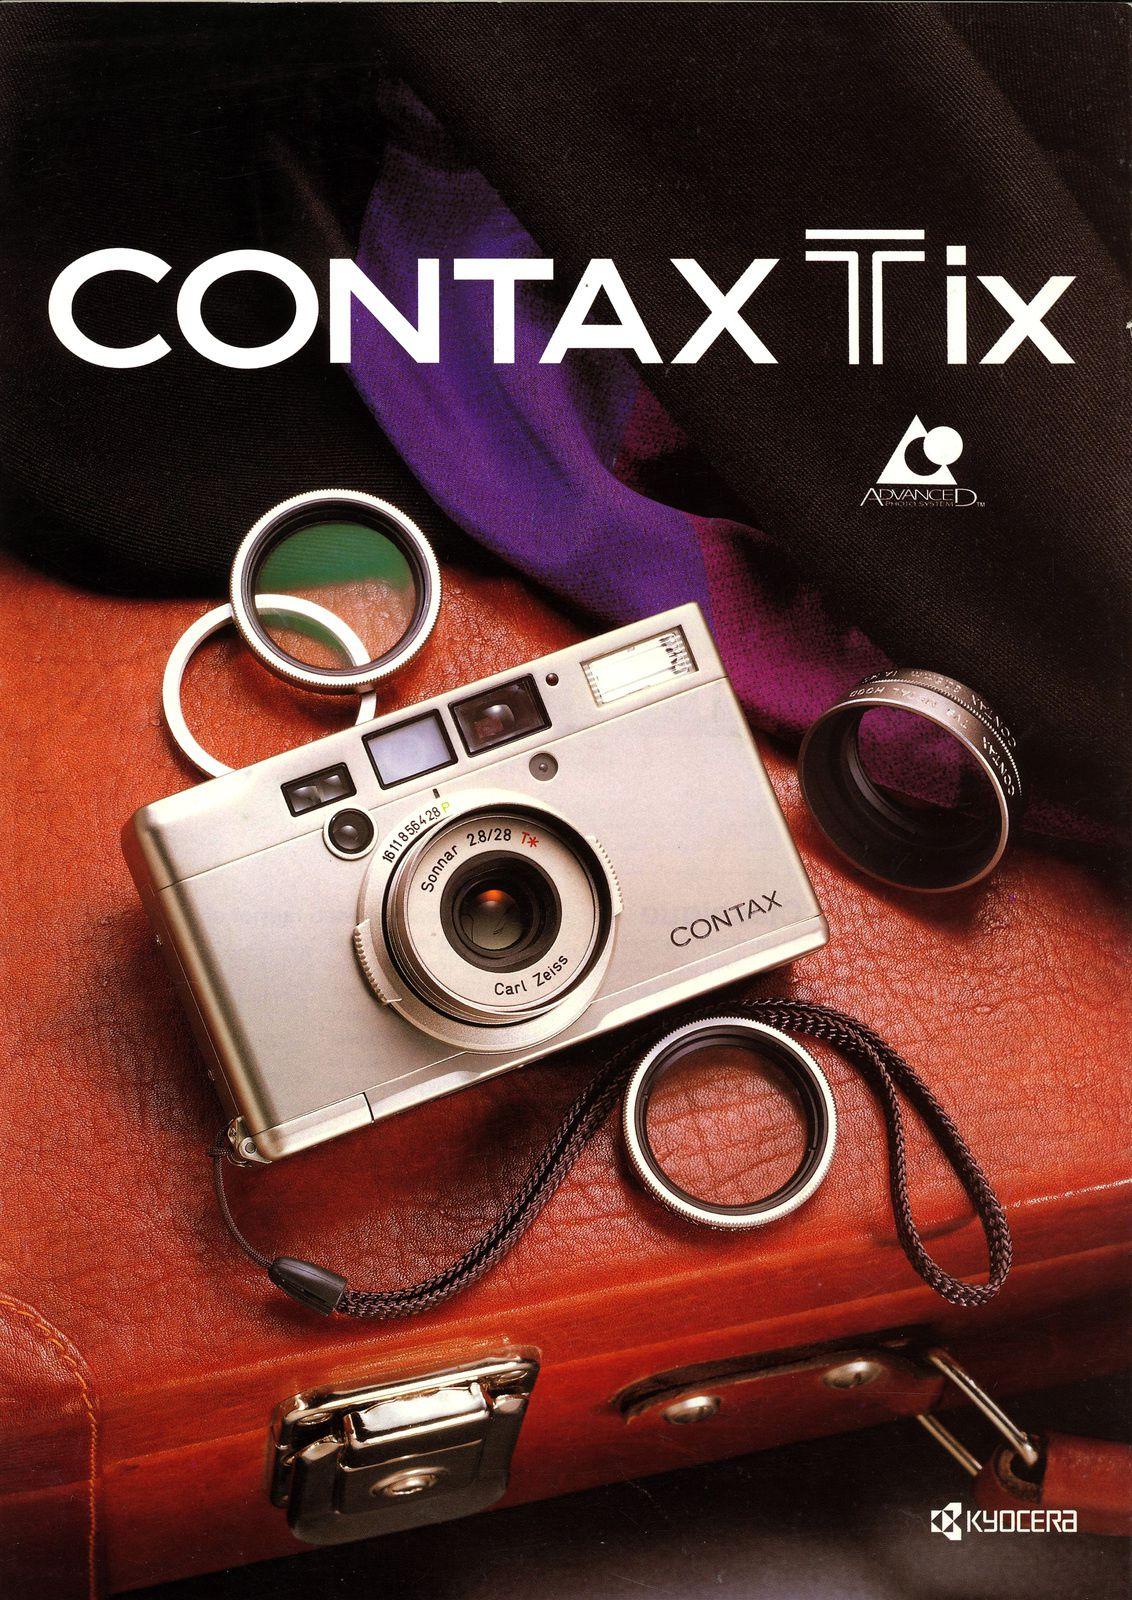 Contax Tix